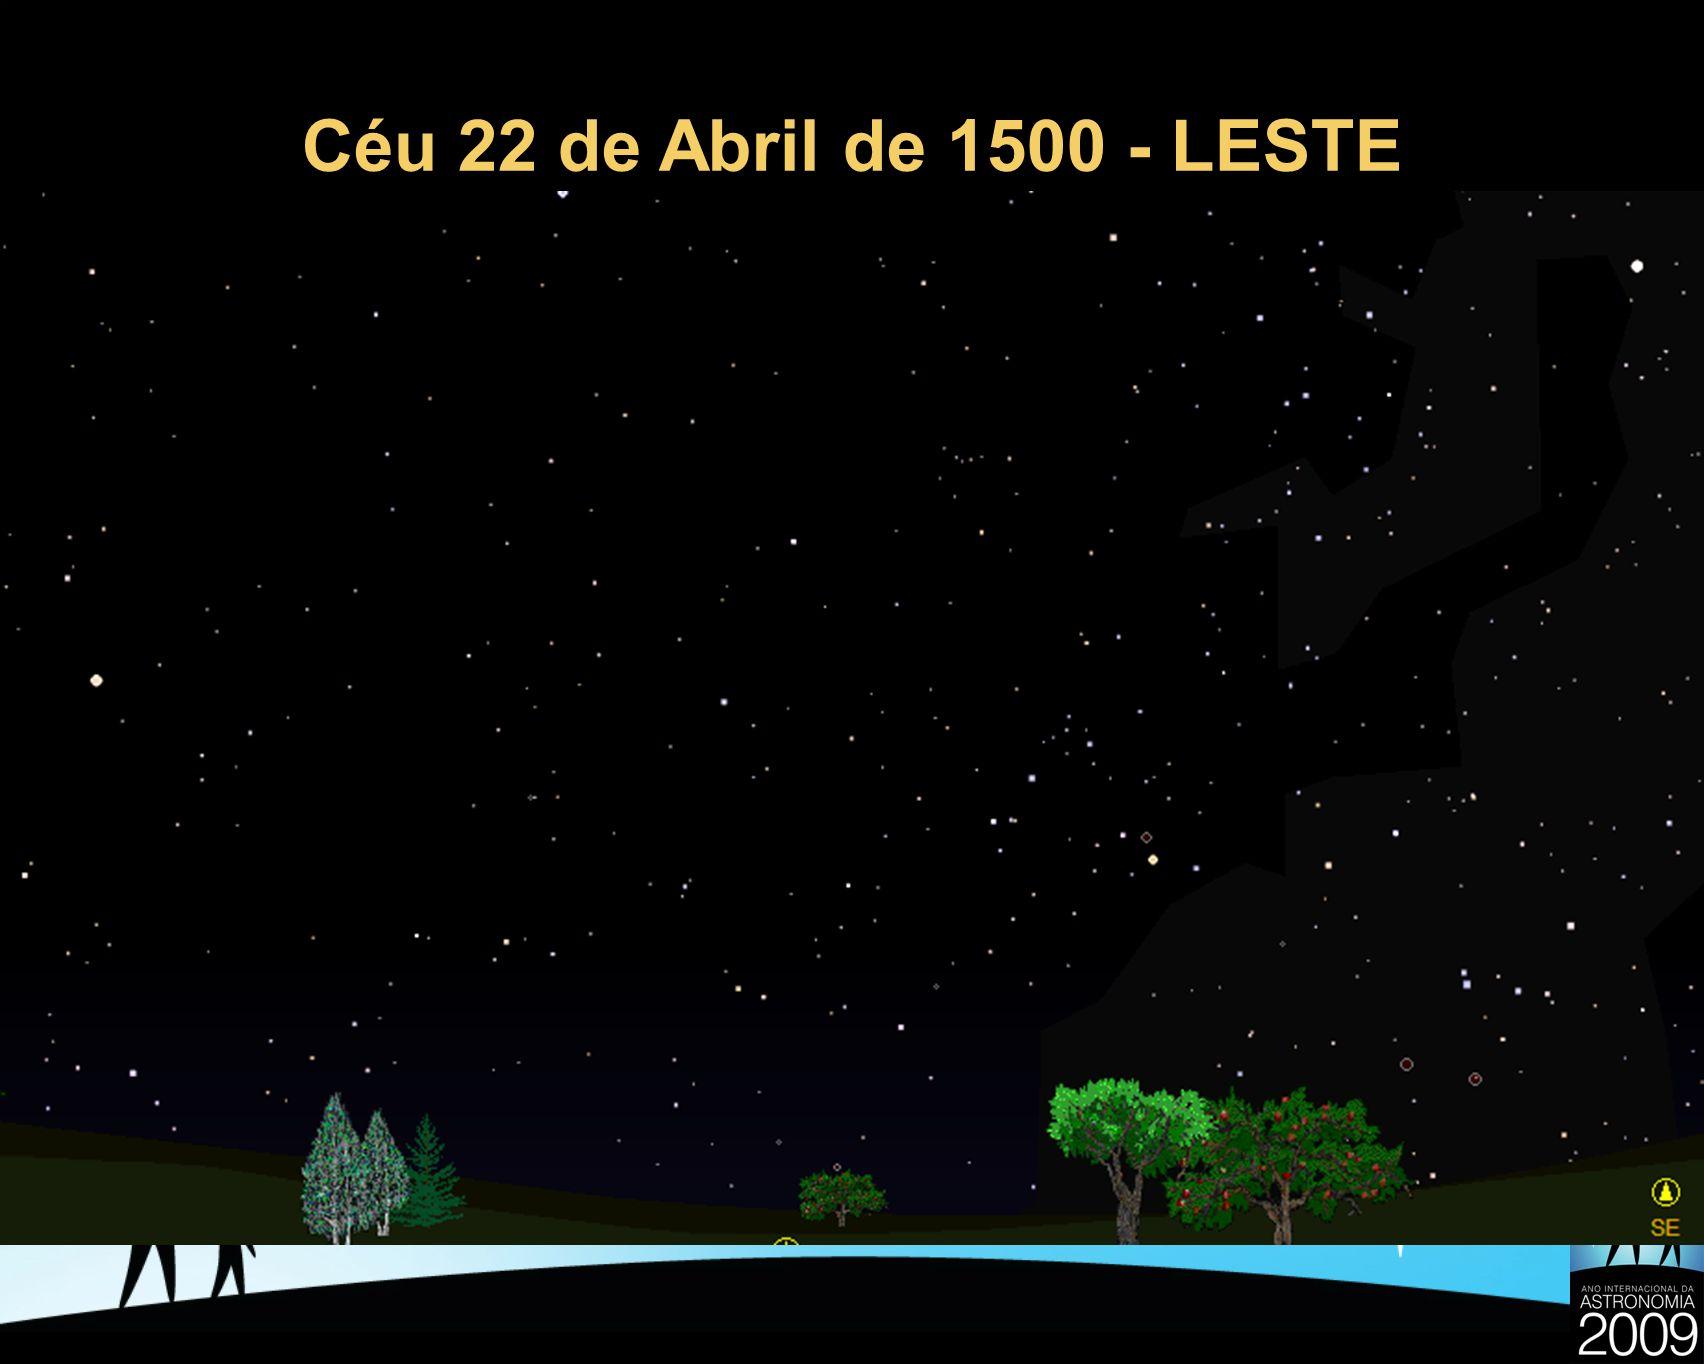 Céu 22 de Abril de 1500 - LESTE